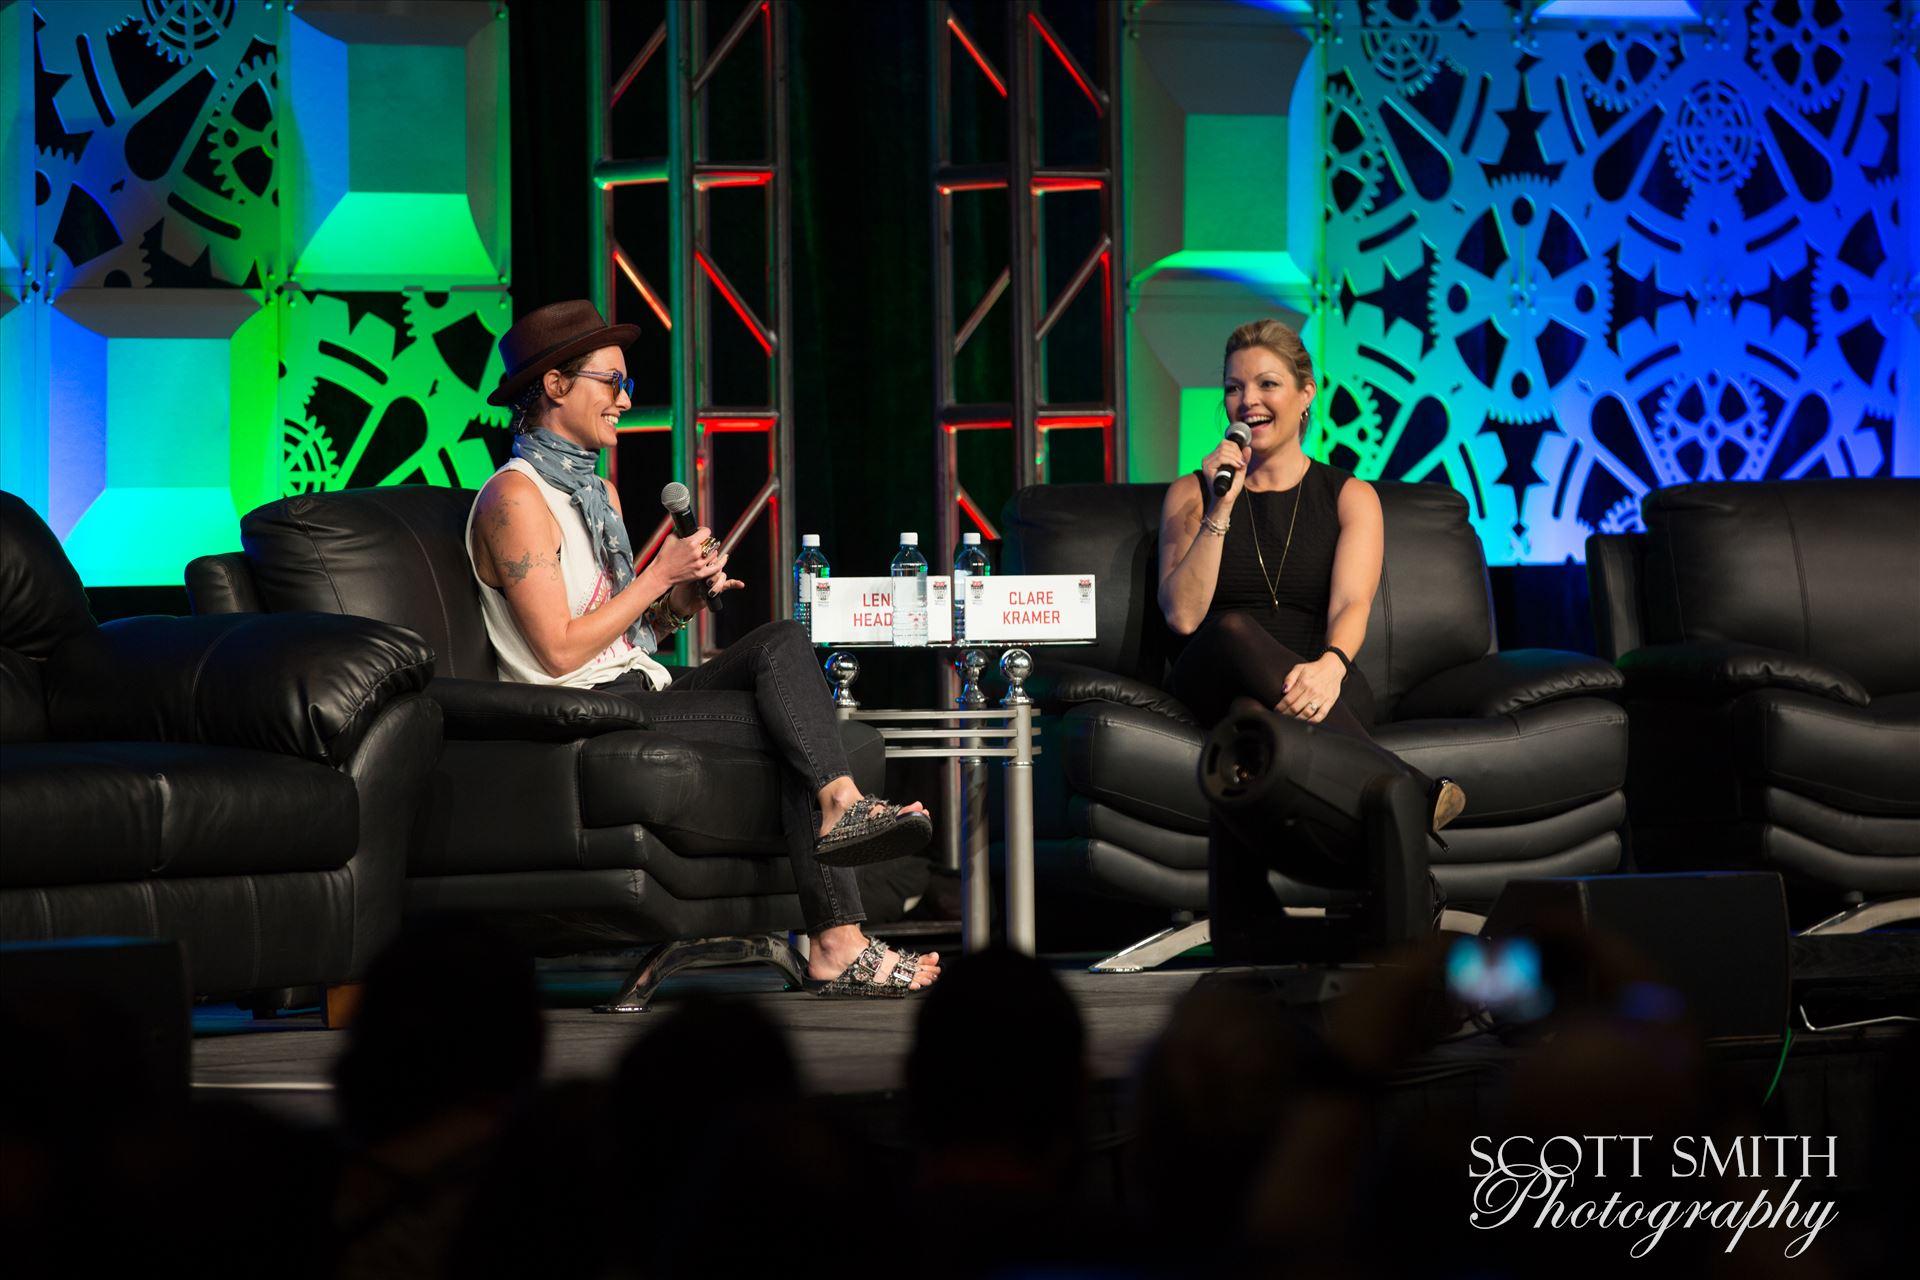 Denver Comic Con 2016 04 - Denver Comic Con 2016 at the Colorado Convention Center. Clare Kramer and Lena Headey. by D Scott Smith